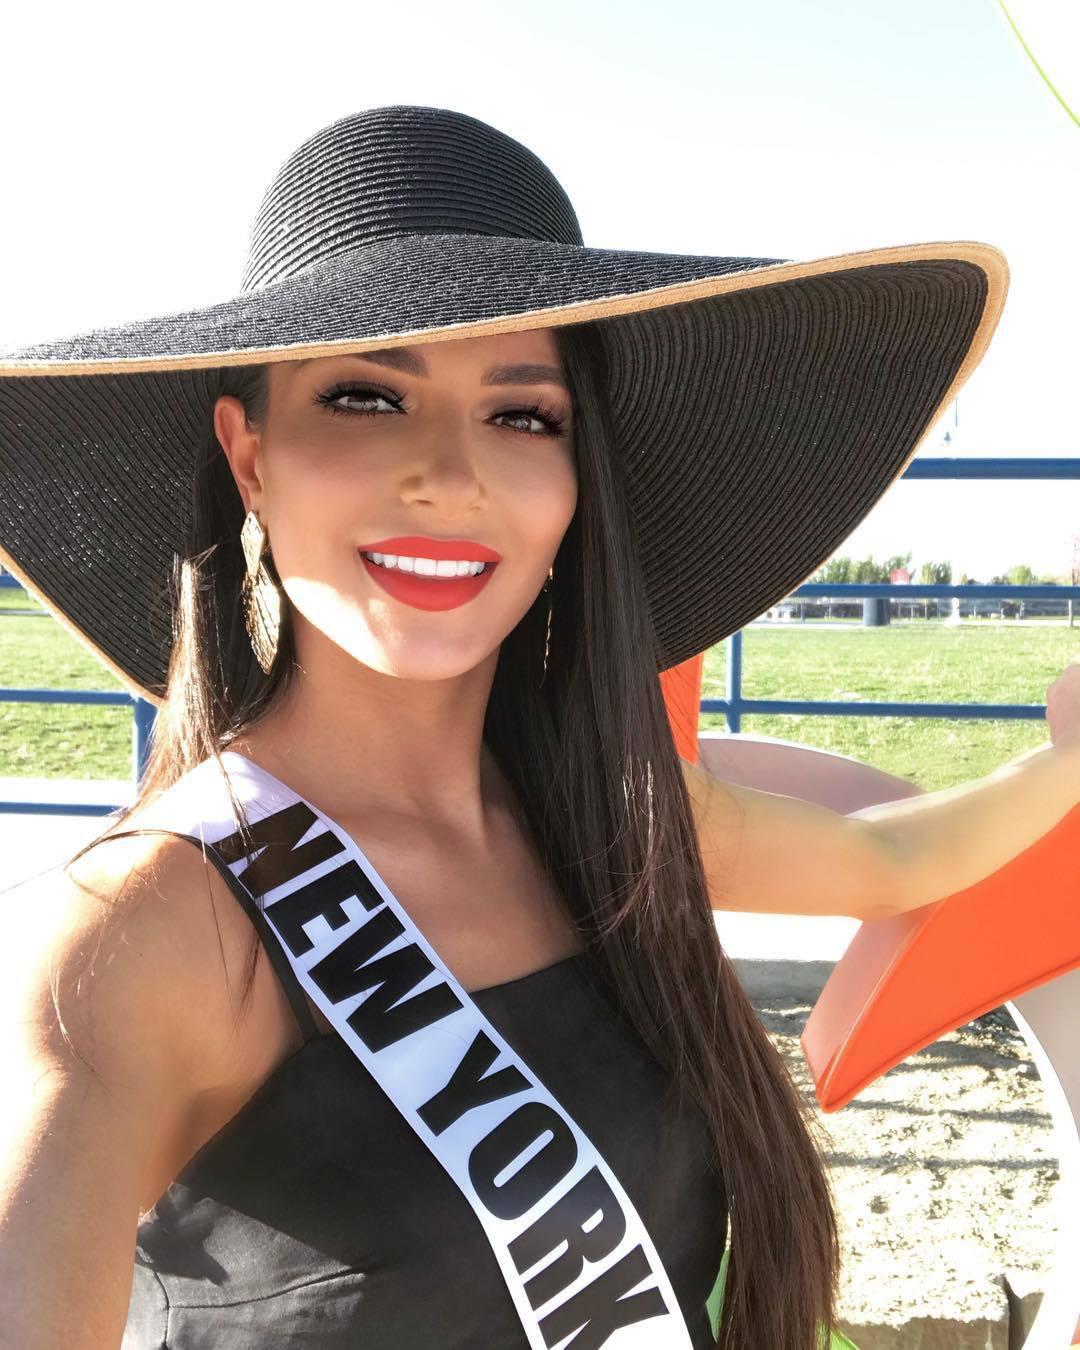 florinda kajtazi, miss new york 2019. - Página 2 57506486_184998459150960_4998214084388812619_n